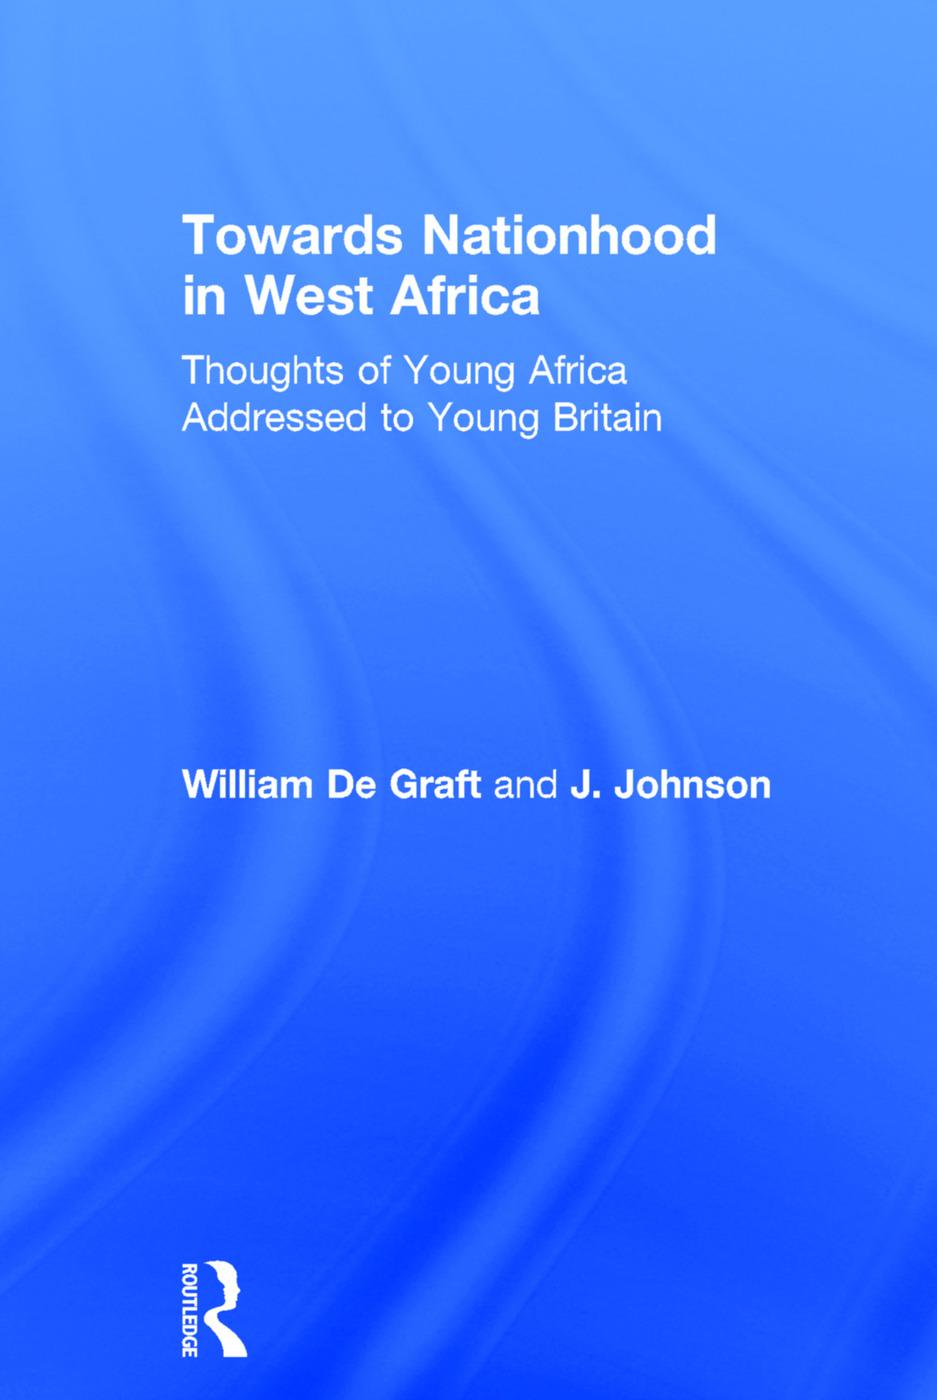 Towards Nationhood in West Africa